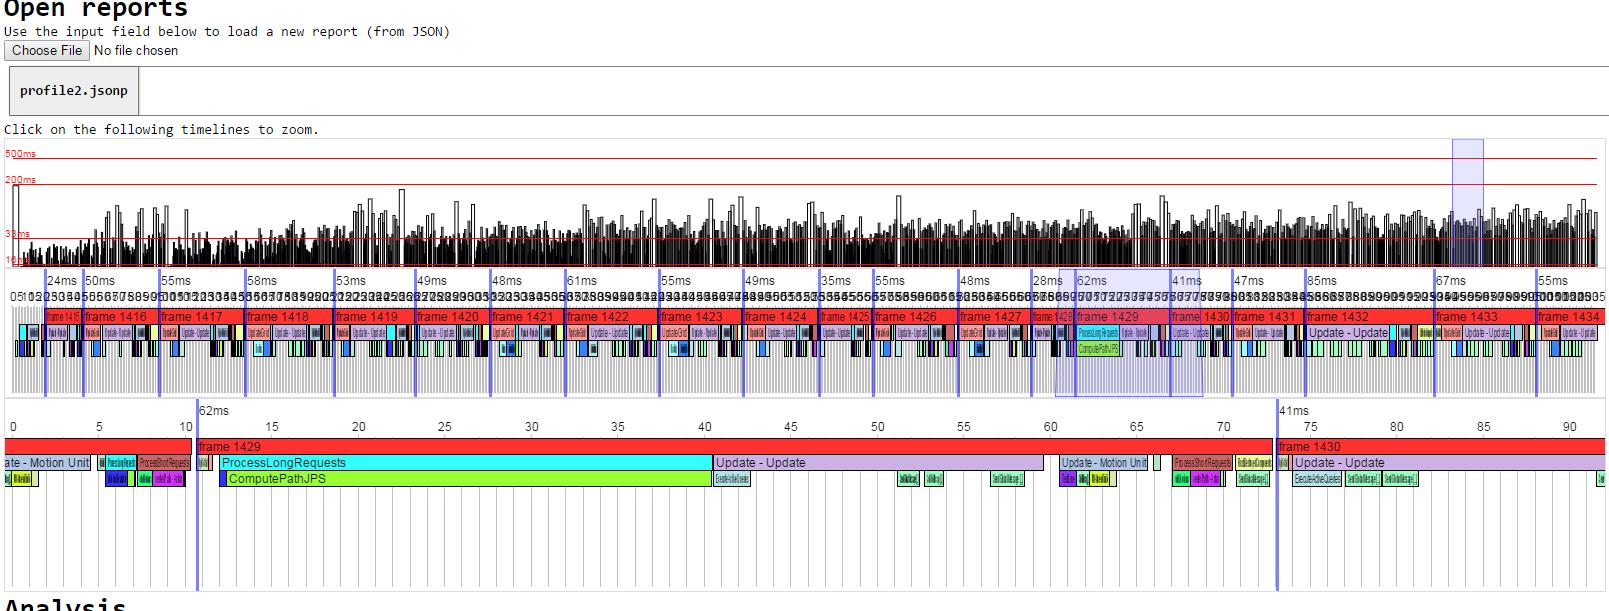 http://trac.wildfiregames.com/raw-attachment/wiki/Profiler2/report-timeline.PNG